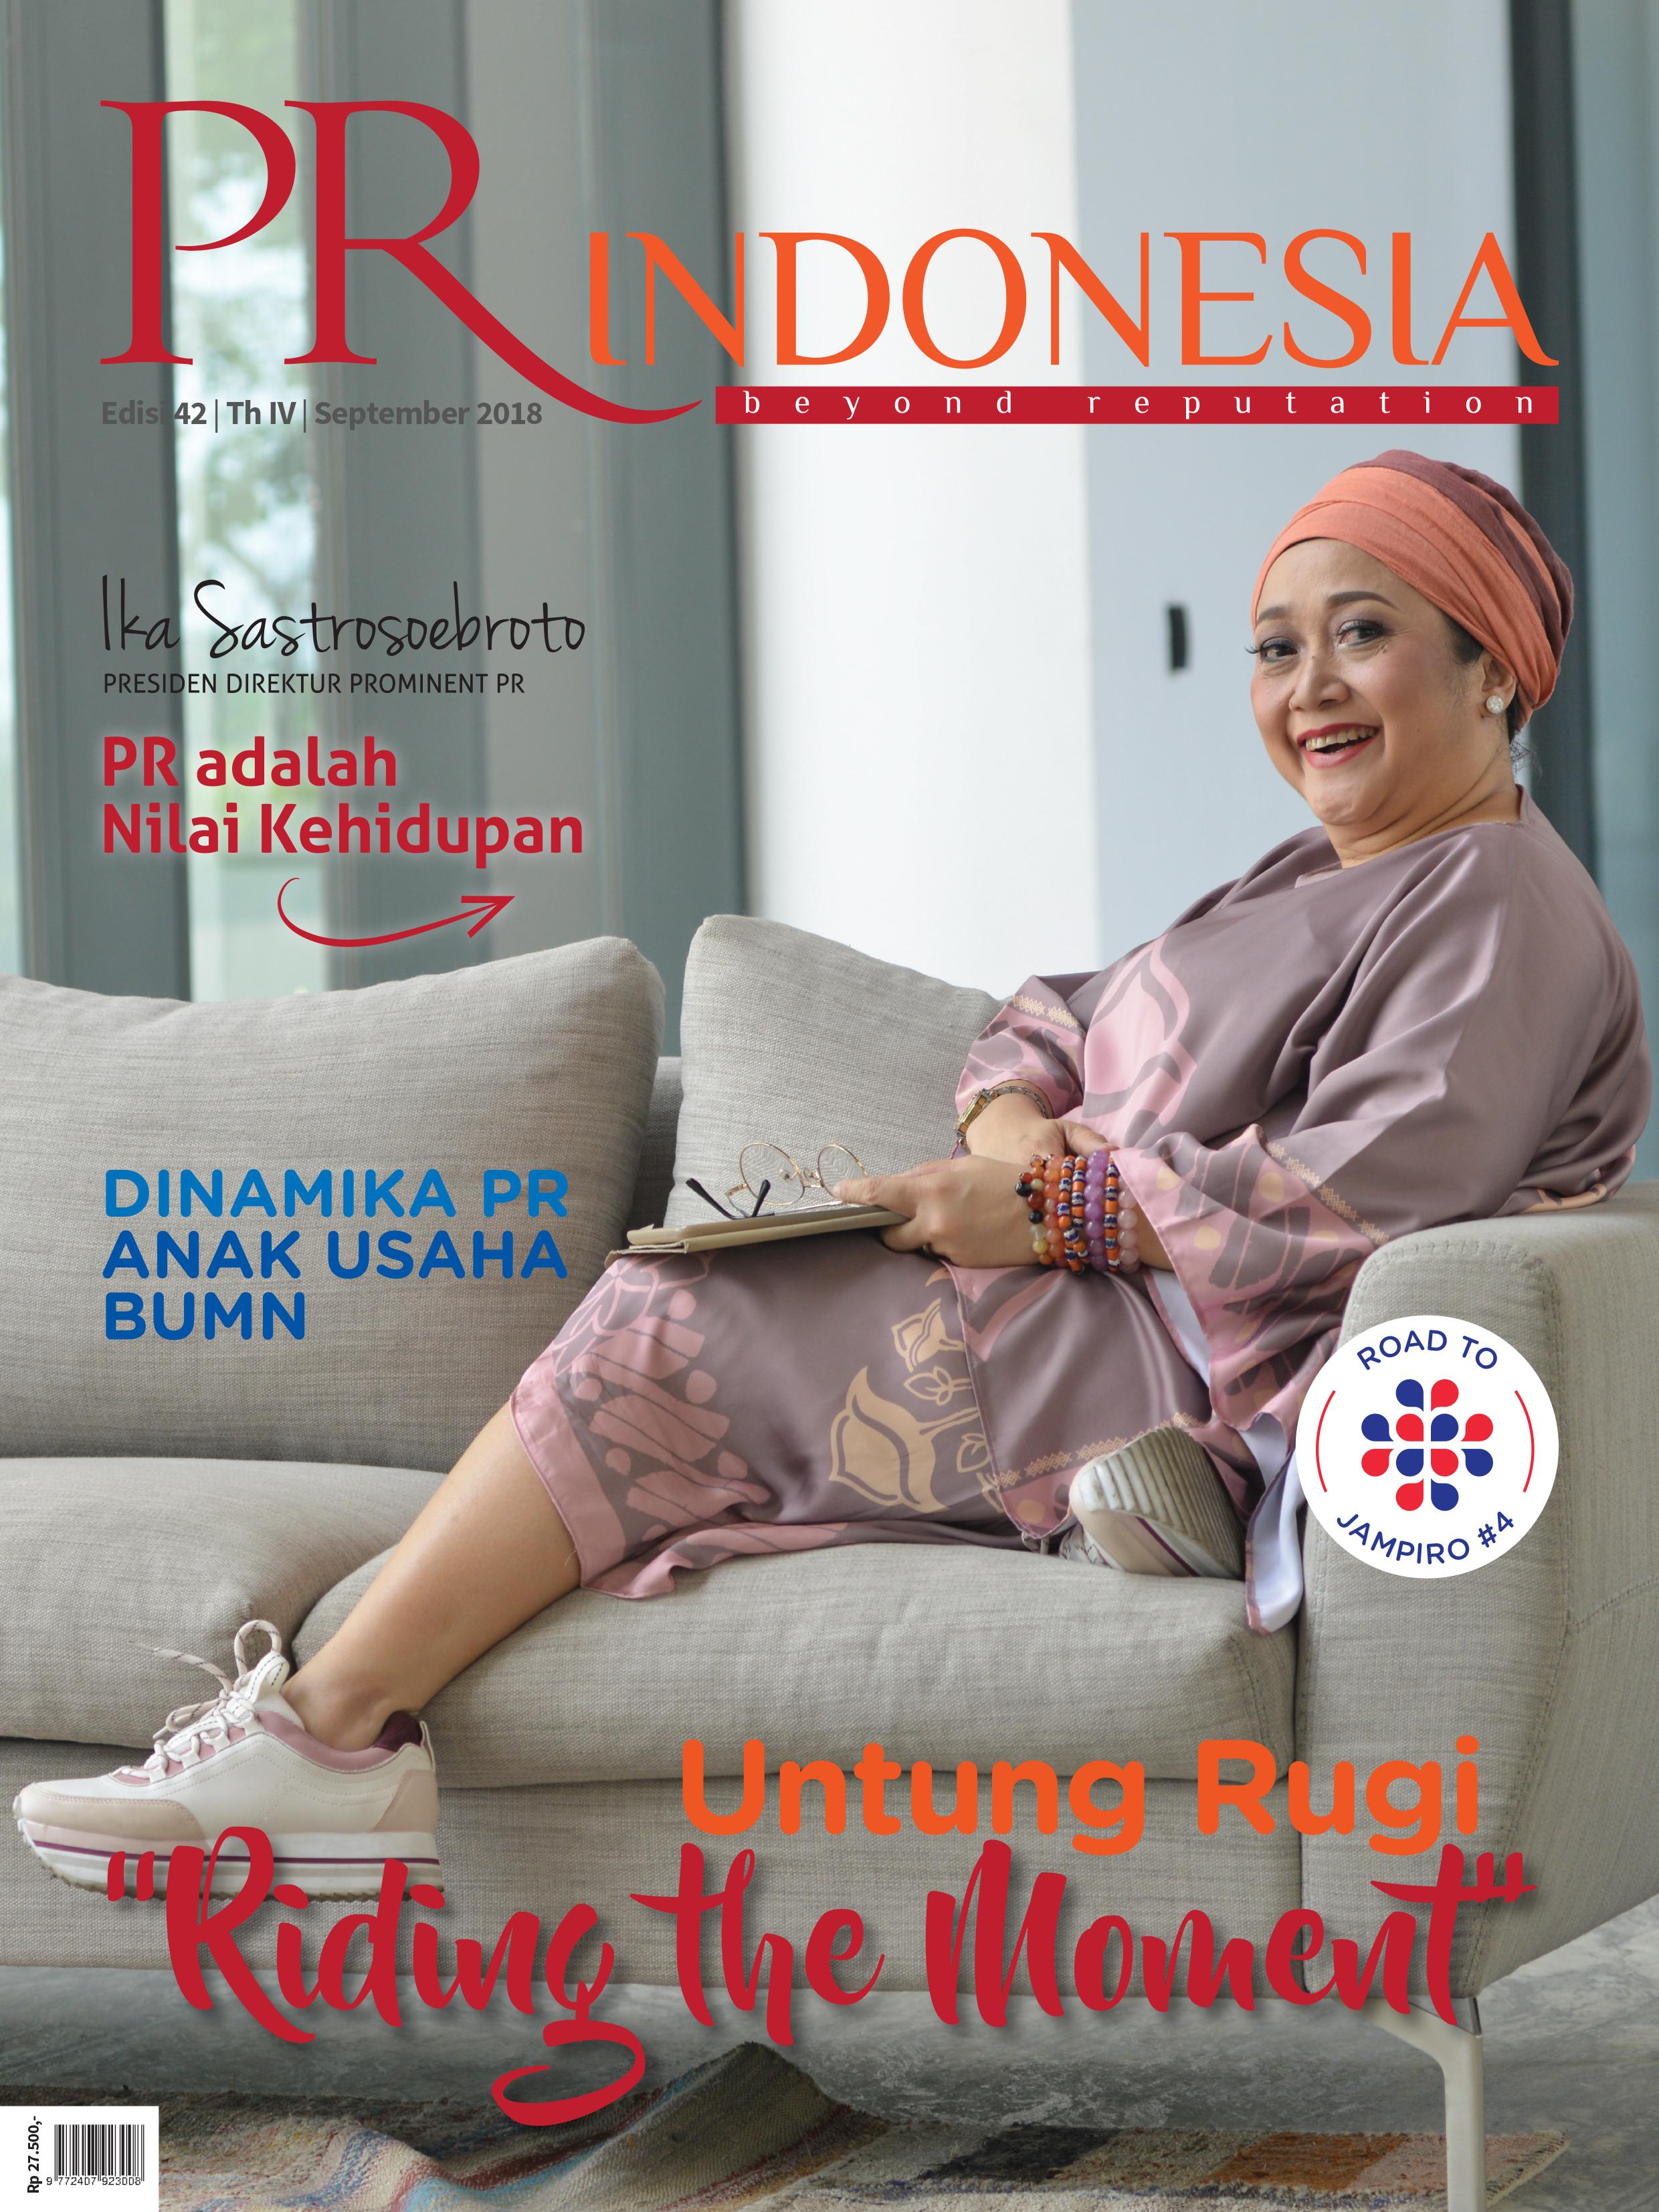 PR INDONESIA-Cover-Edisi 42-September 2018